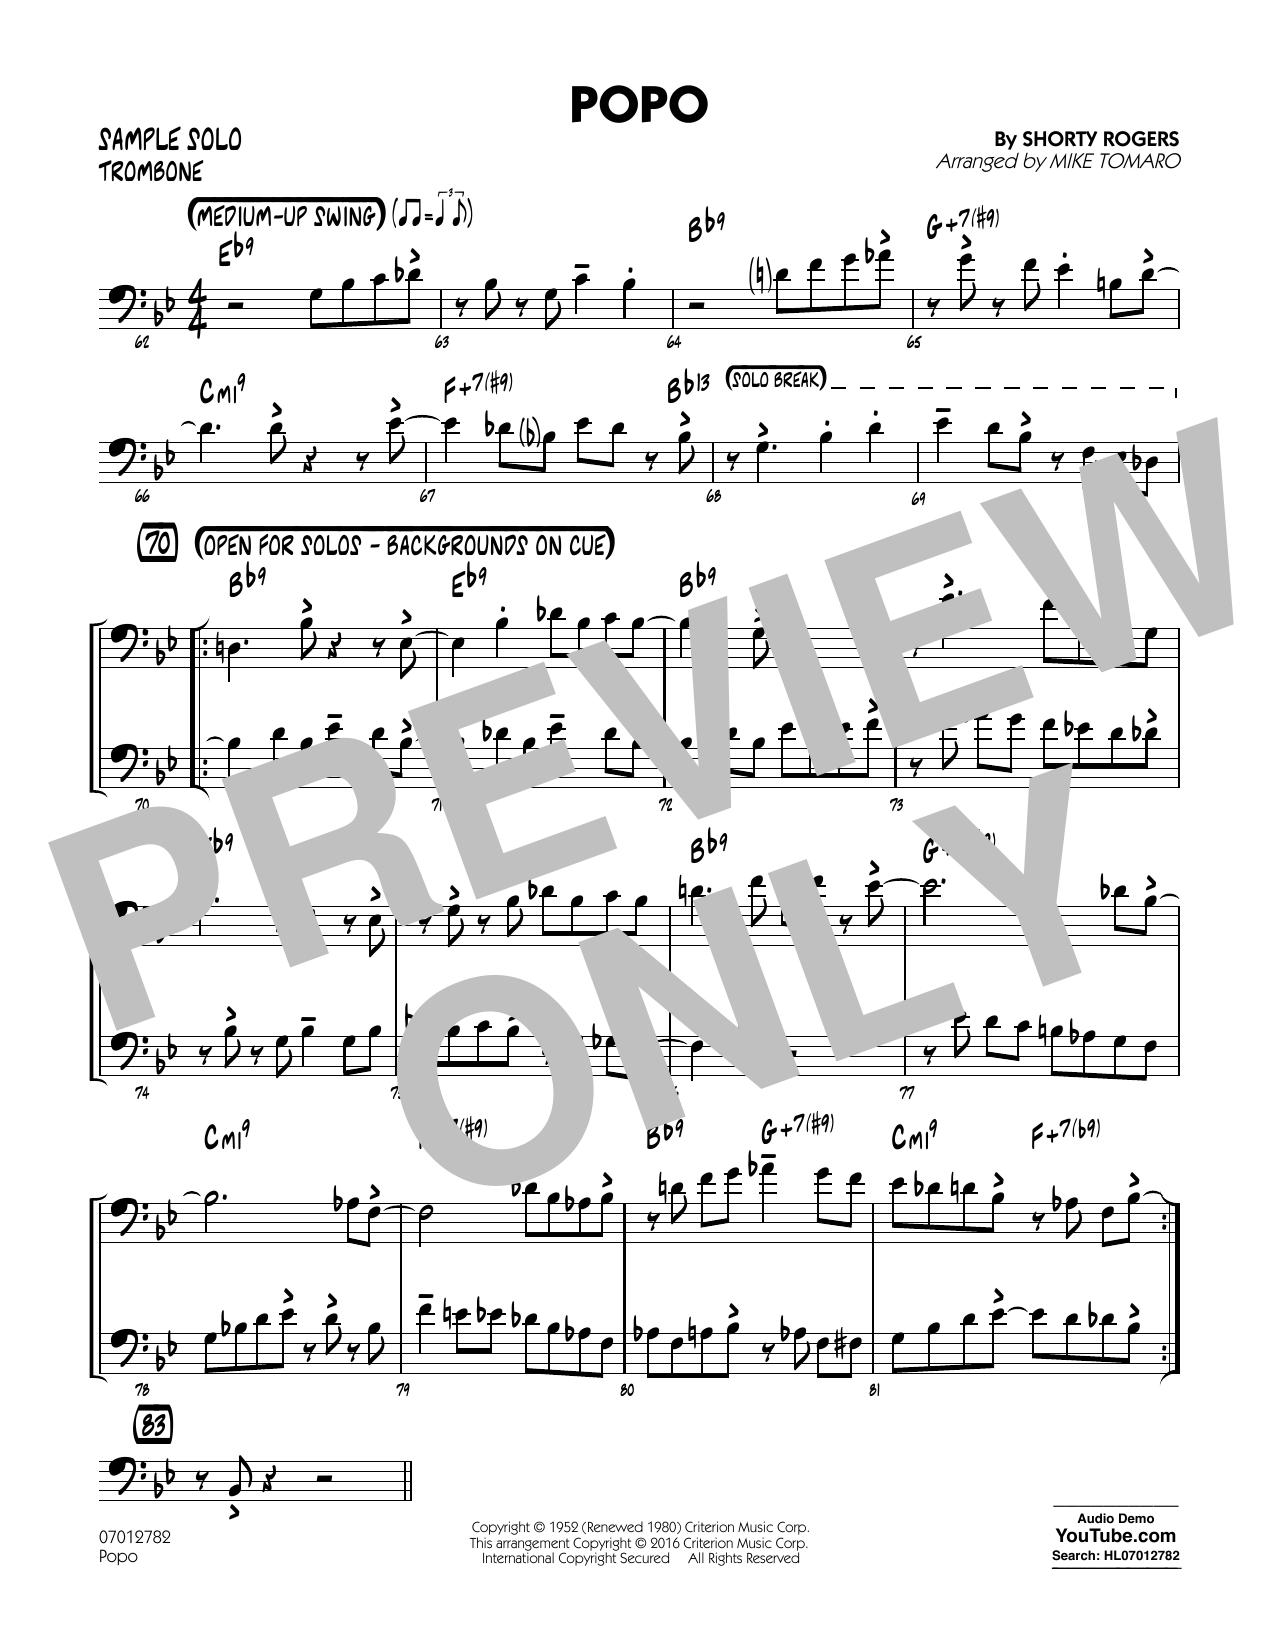 Popo - Trombone Sample Solo (Jazz Ensemble)